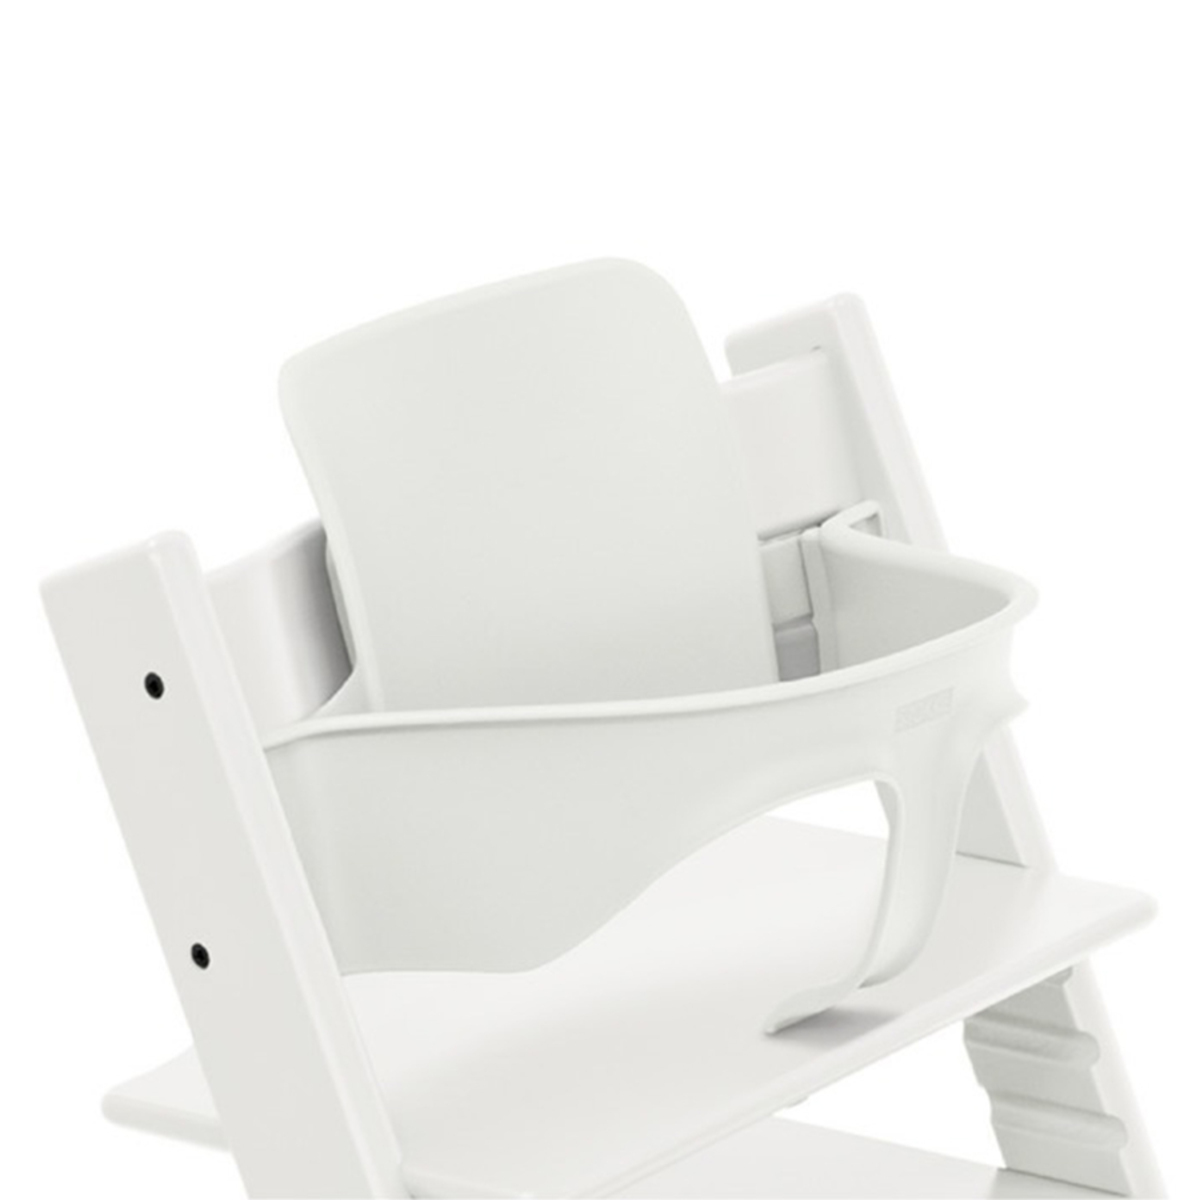 Chaise haute Tripp Trapp Baby Set - Blanc Tripp Trapp Baby Set - Blanc